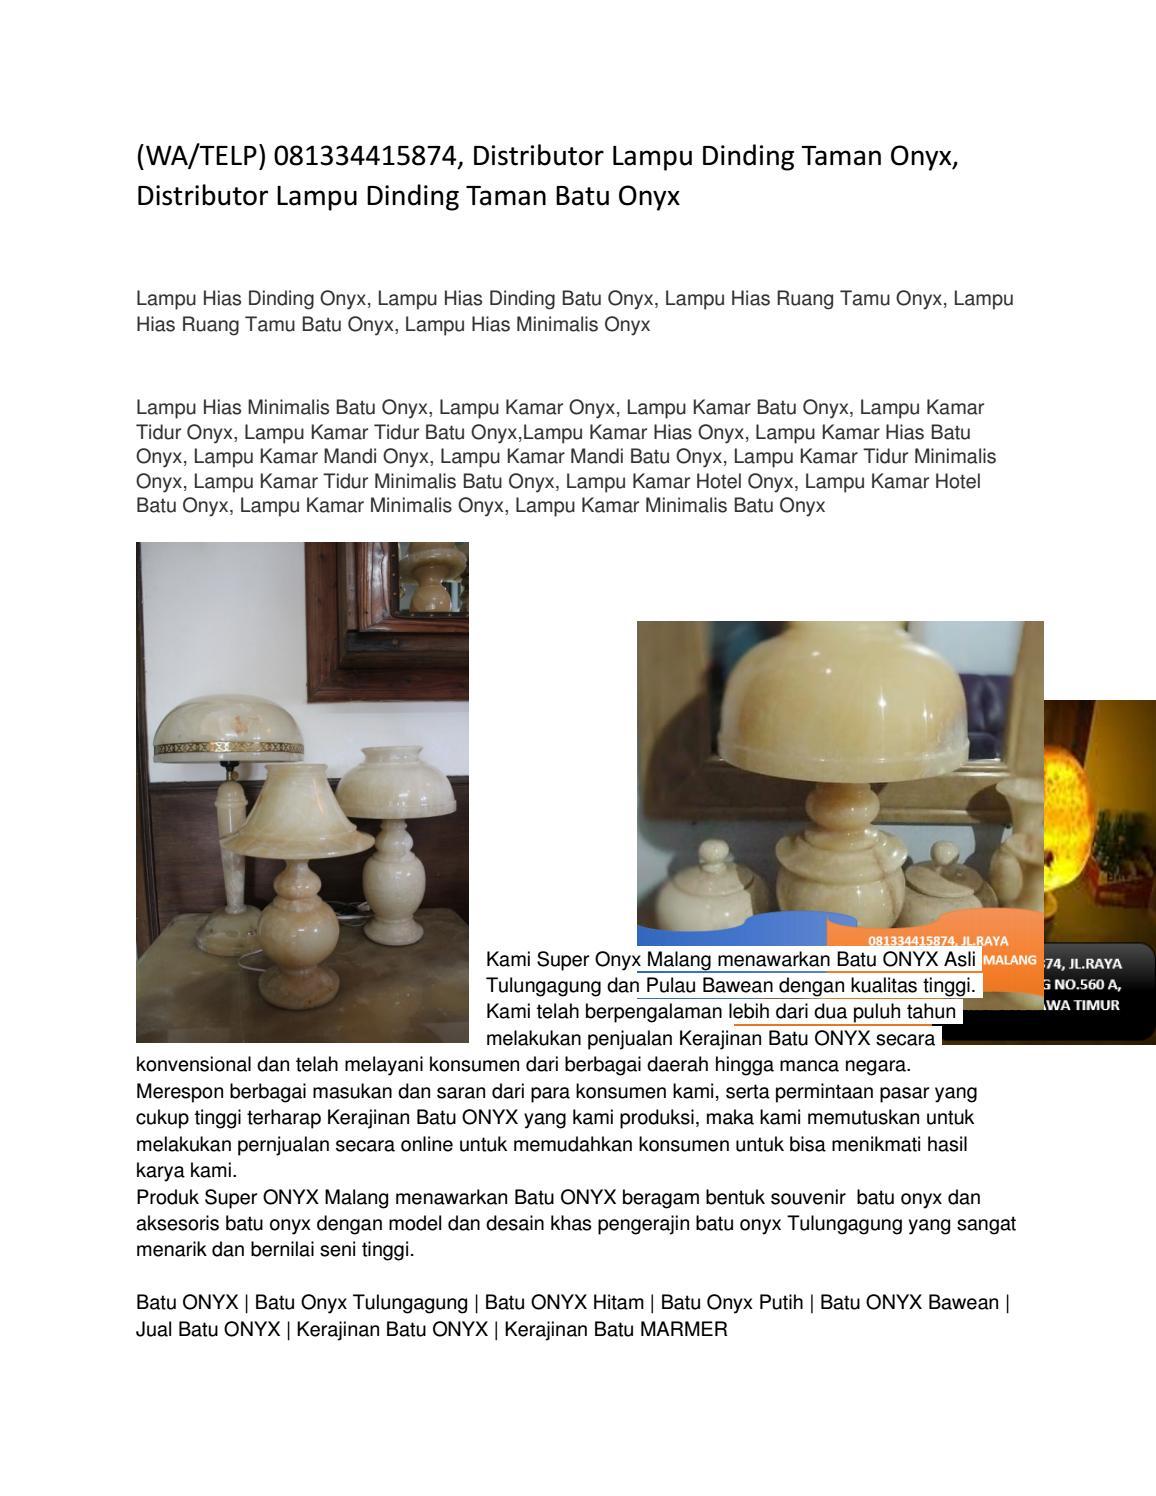 Wa Telp 081334415874 Distributor Lampu Dinding Taman Onyx Distributor Lampu Dinding Taman Batu O By Marketing6superonyx Issuu